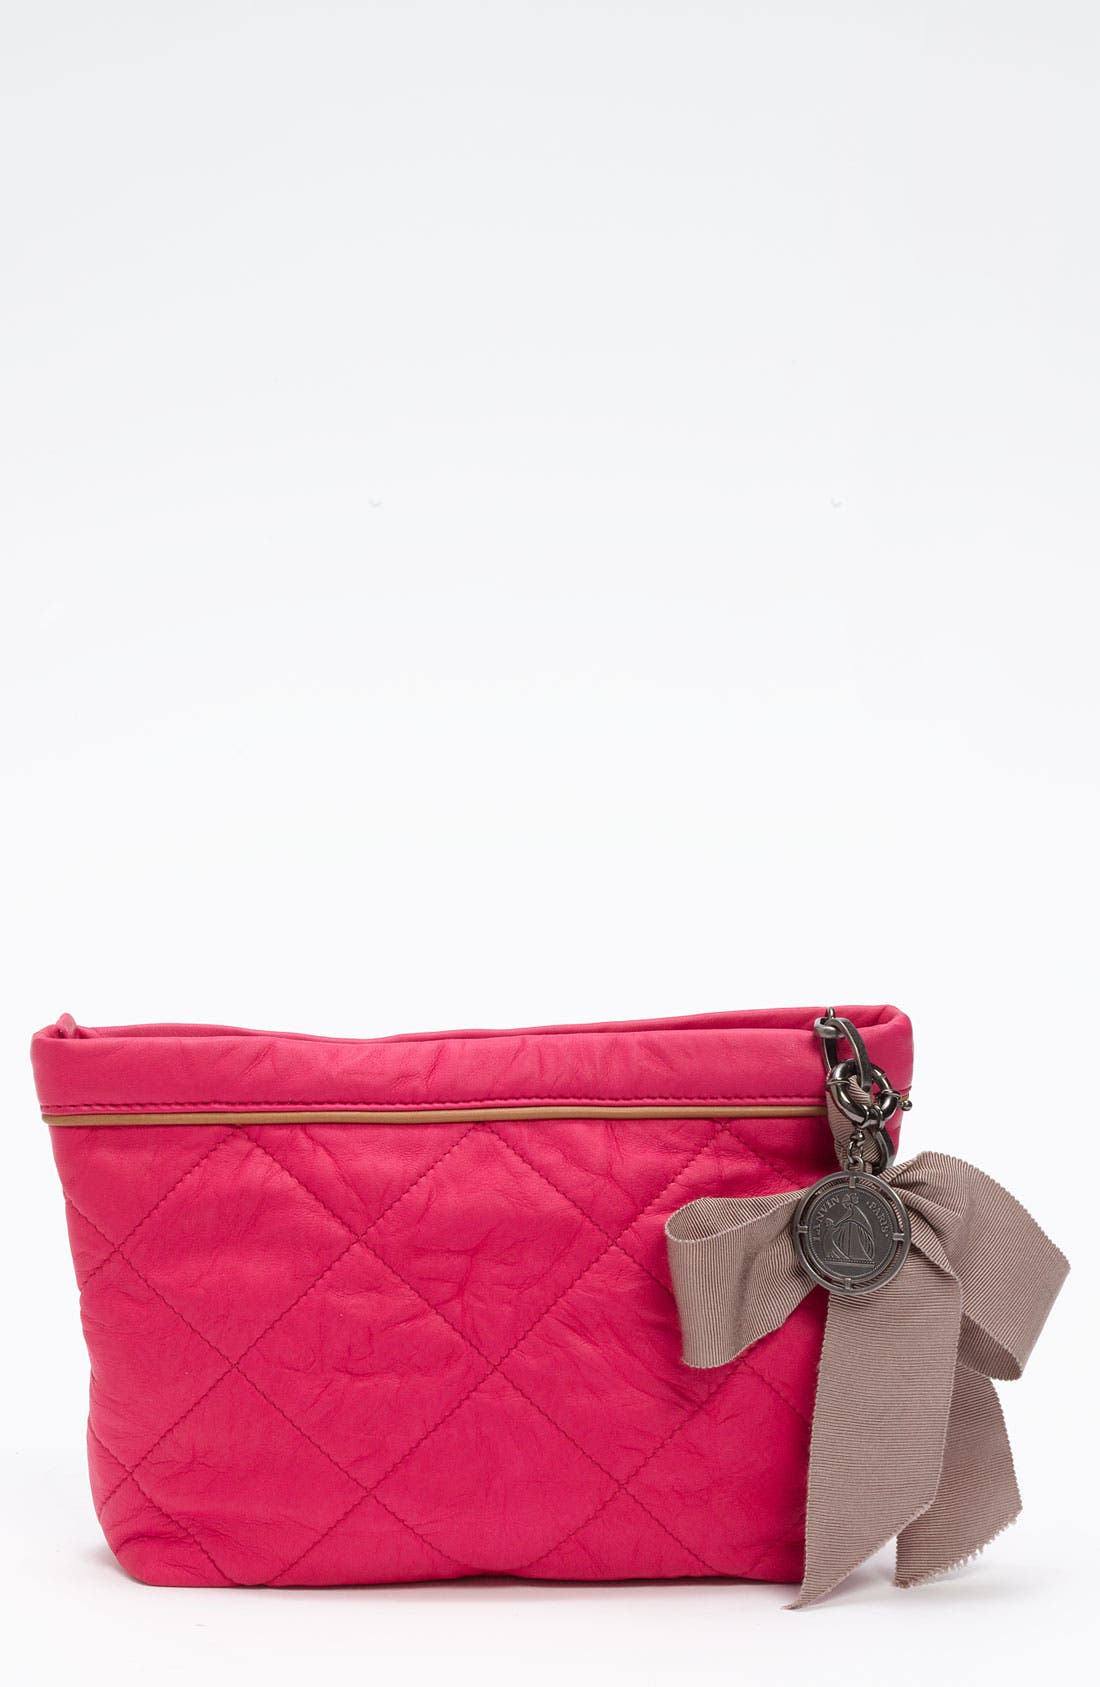 Alternate Image 1 Selected - Lanvin 'Amalia' Leather Pouchette